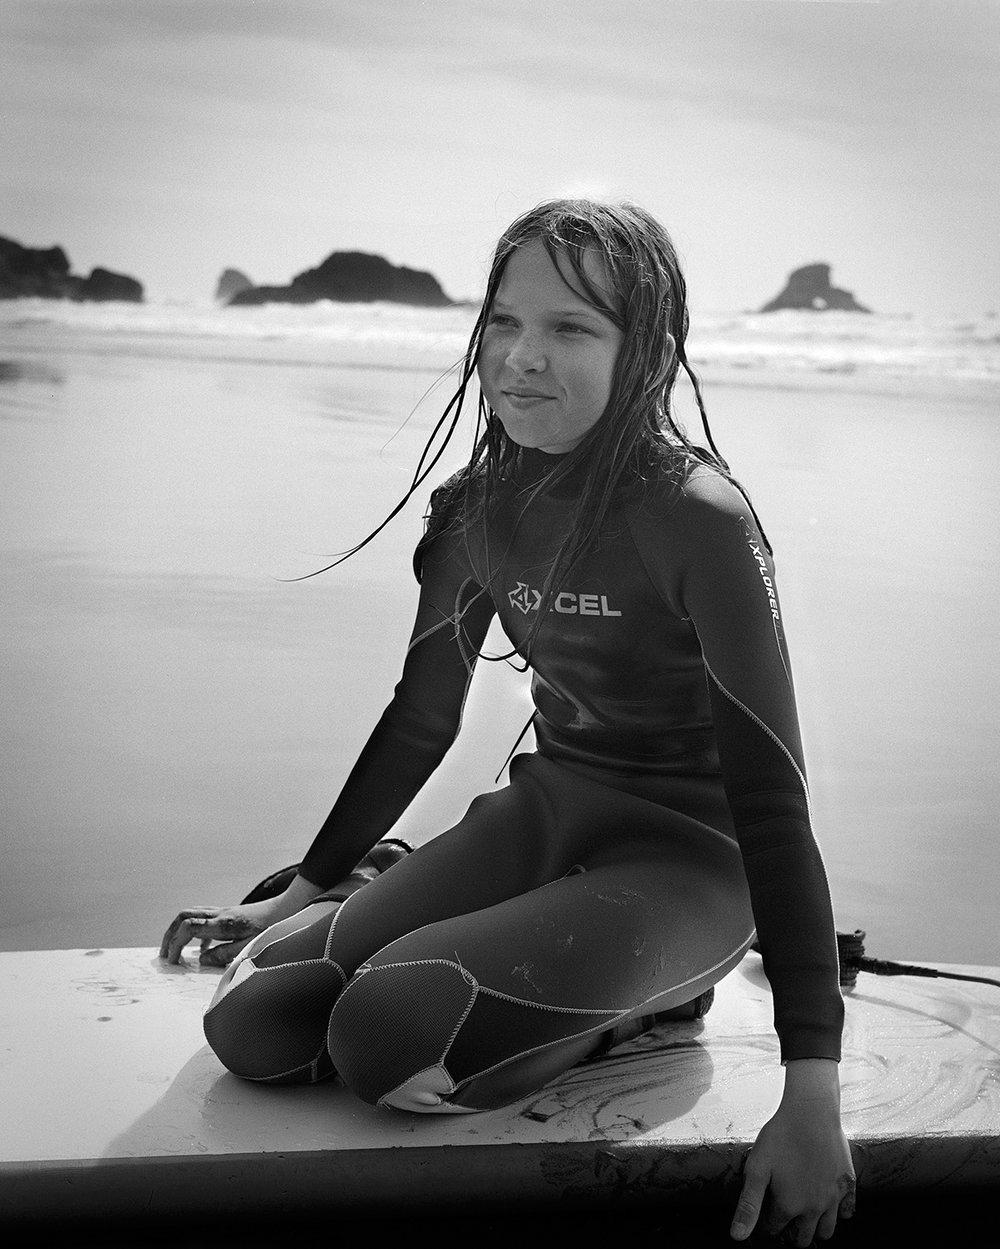 surfing2_edit.jpg